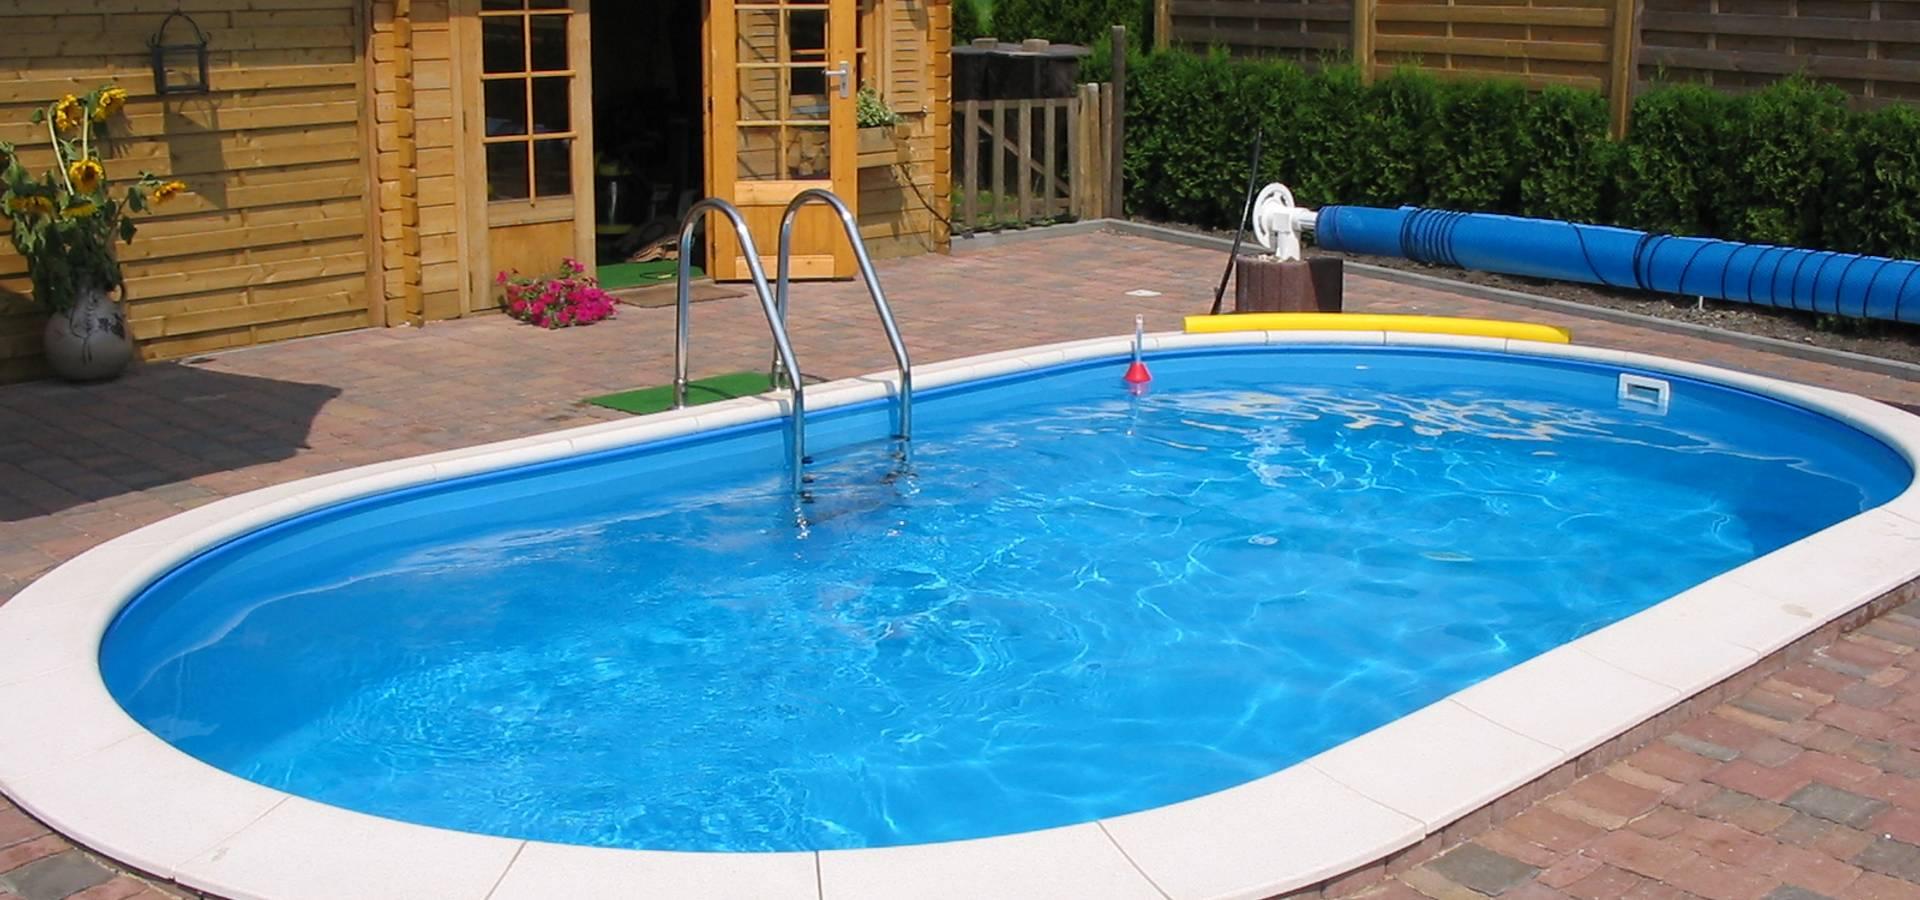 hobby pool technologies gmbh stahlwandbecken toscana homify. Black Bedroom Furniture Sets. Home Design Ideas